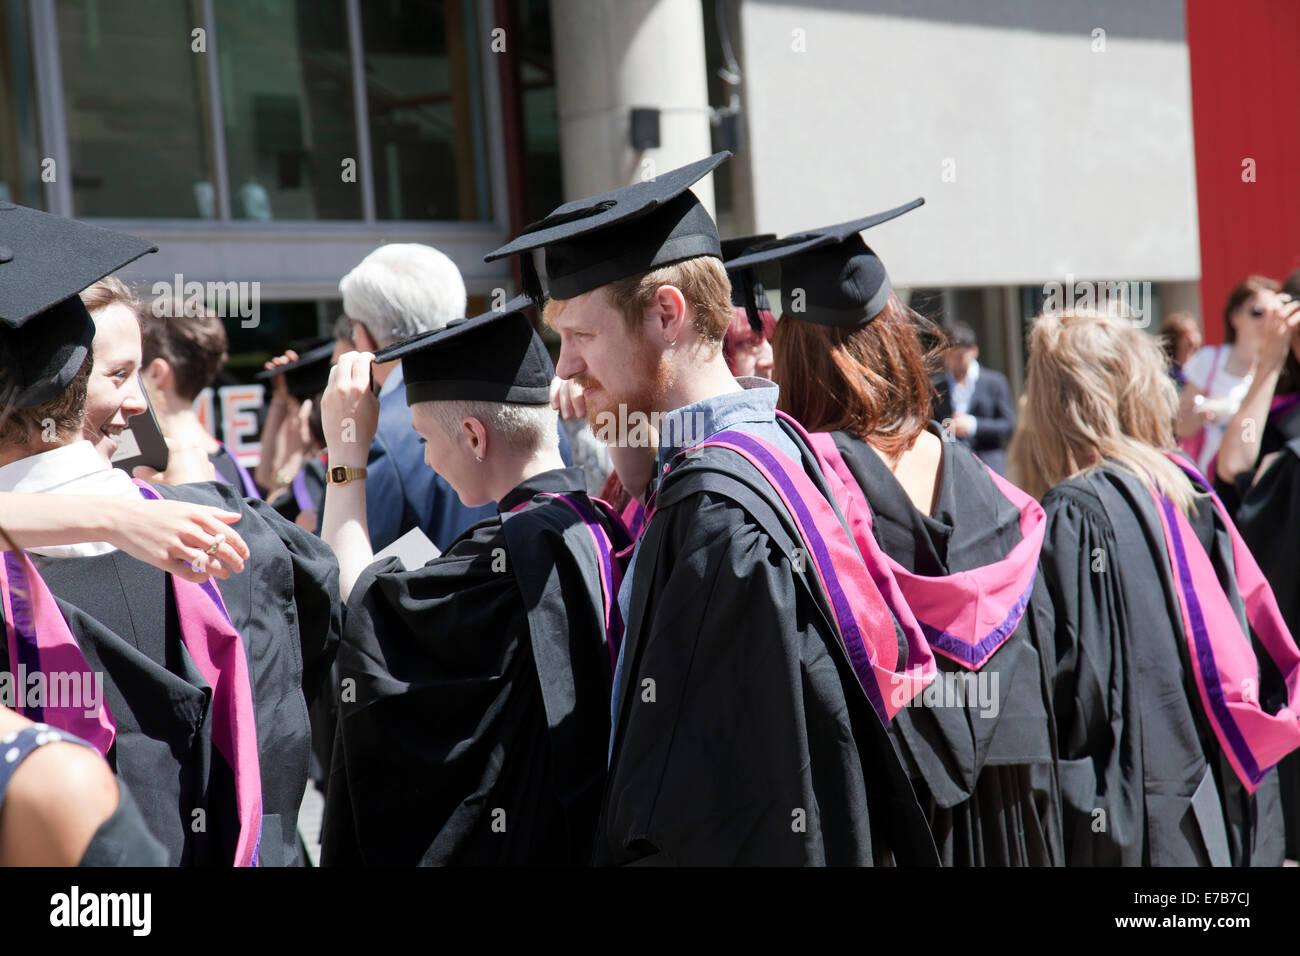 Fantastic Ede And Ravenscroft Graduation Gowns Vignette - Wedding ...